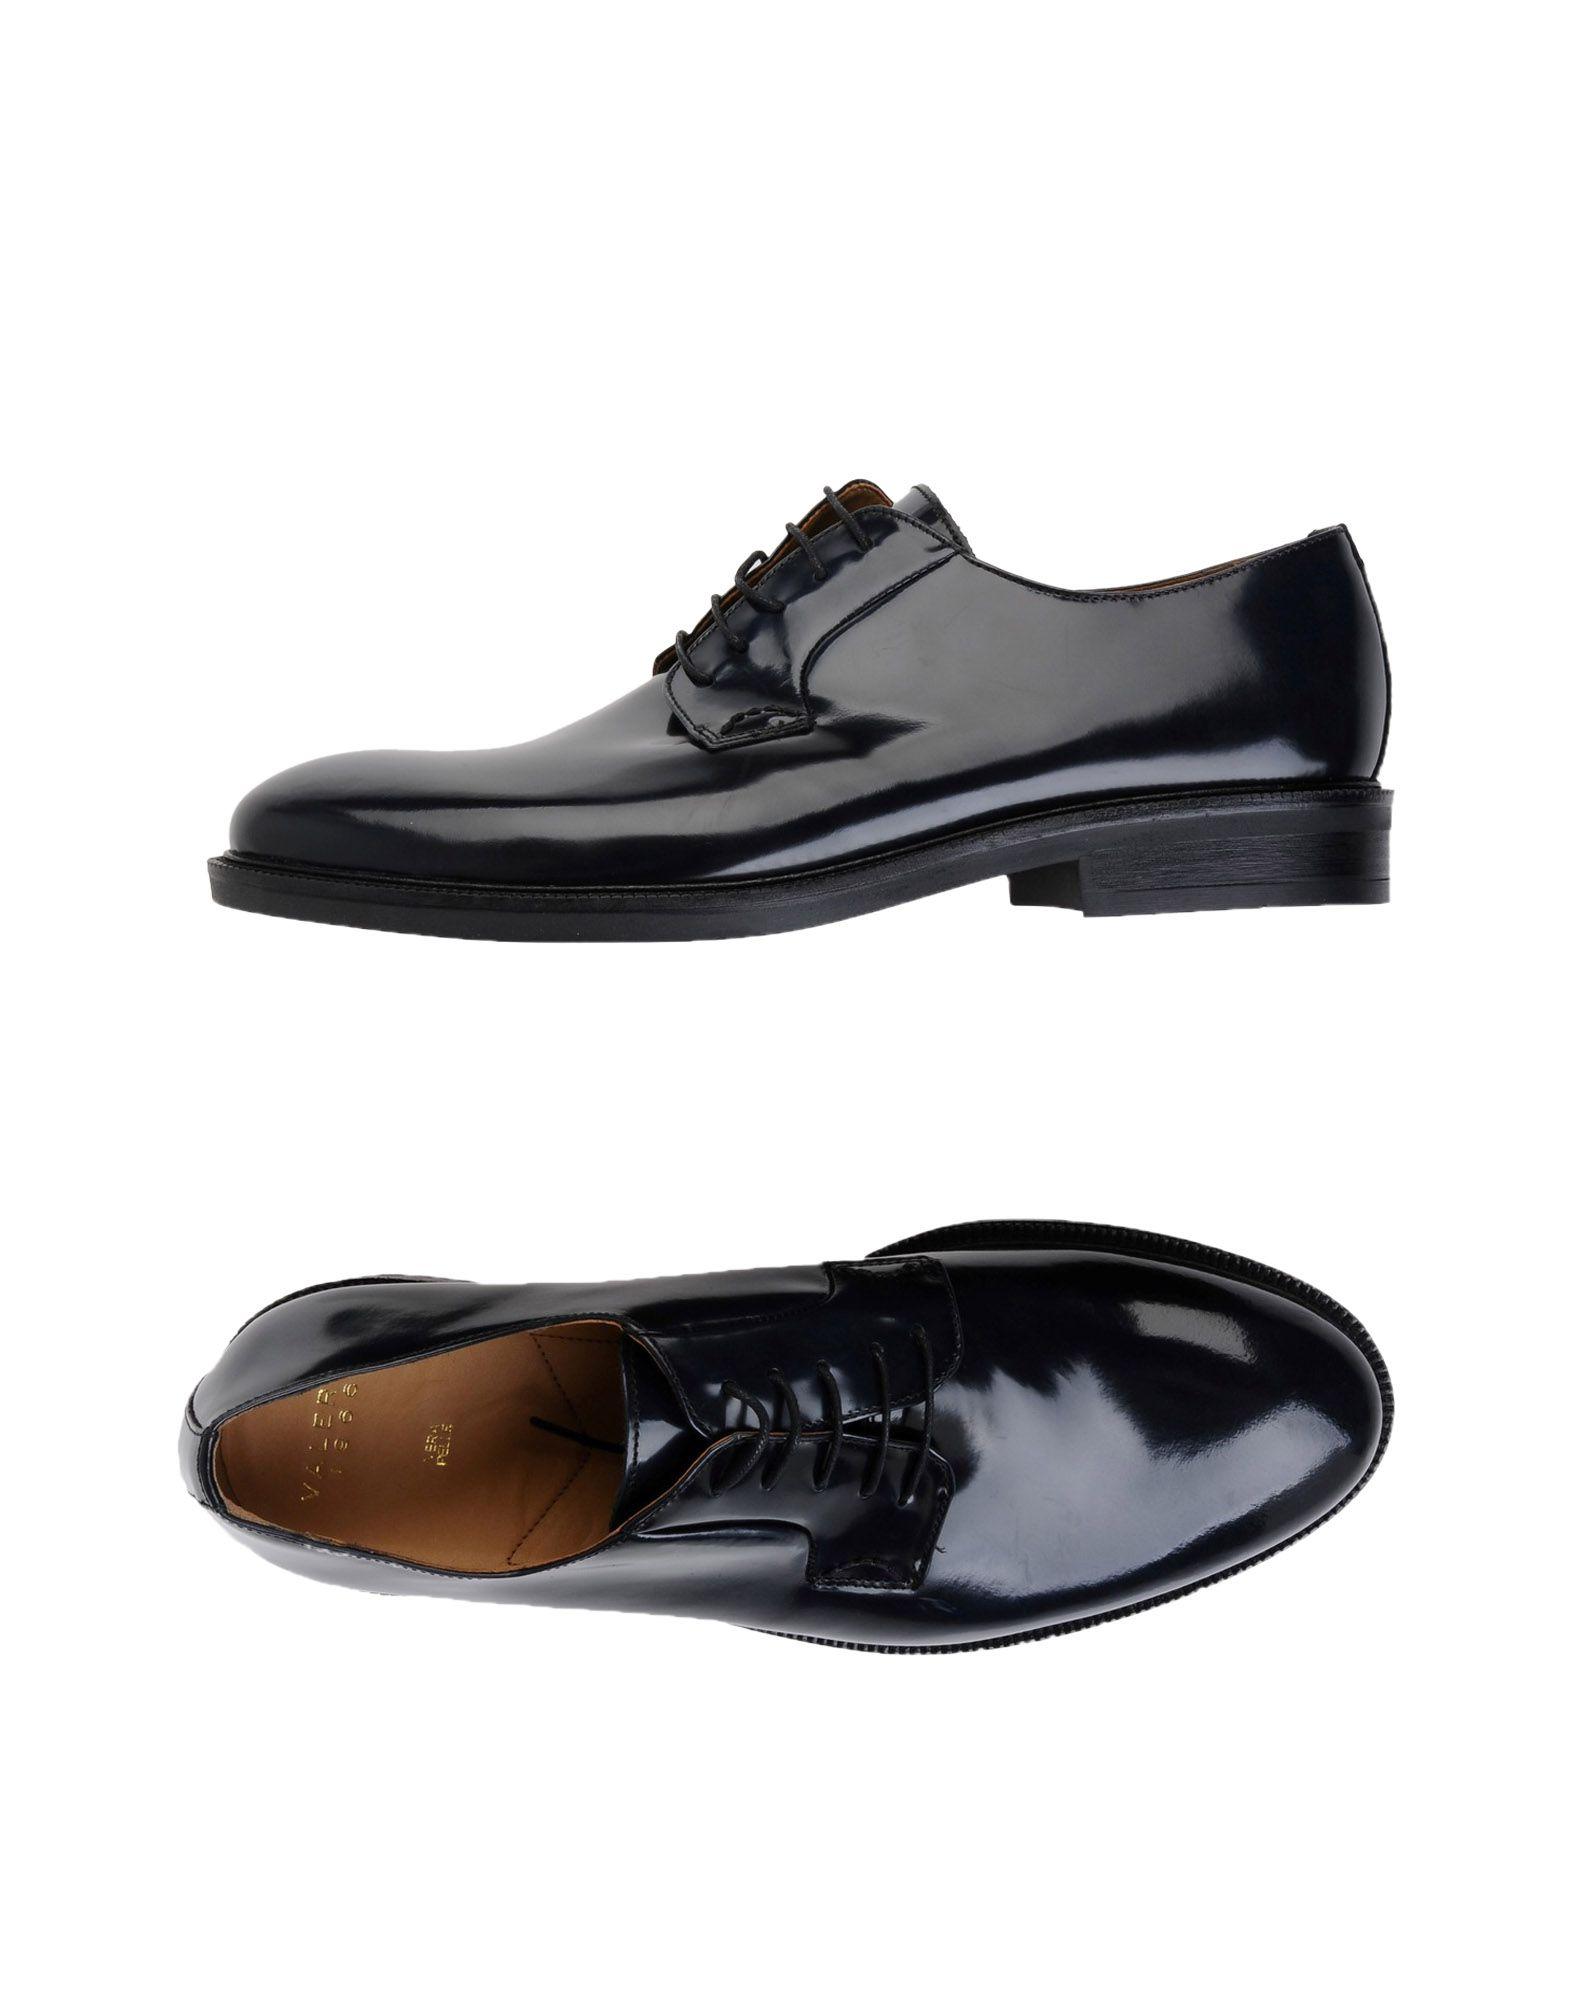 Rabatt echte Schuhe Valerio 1966 Schnürschuhe Herren  11470801TV